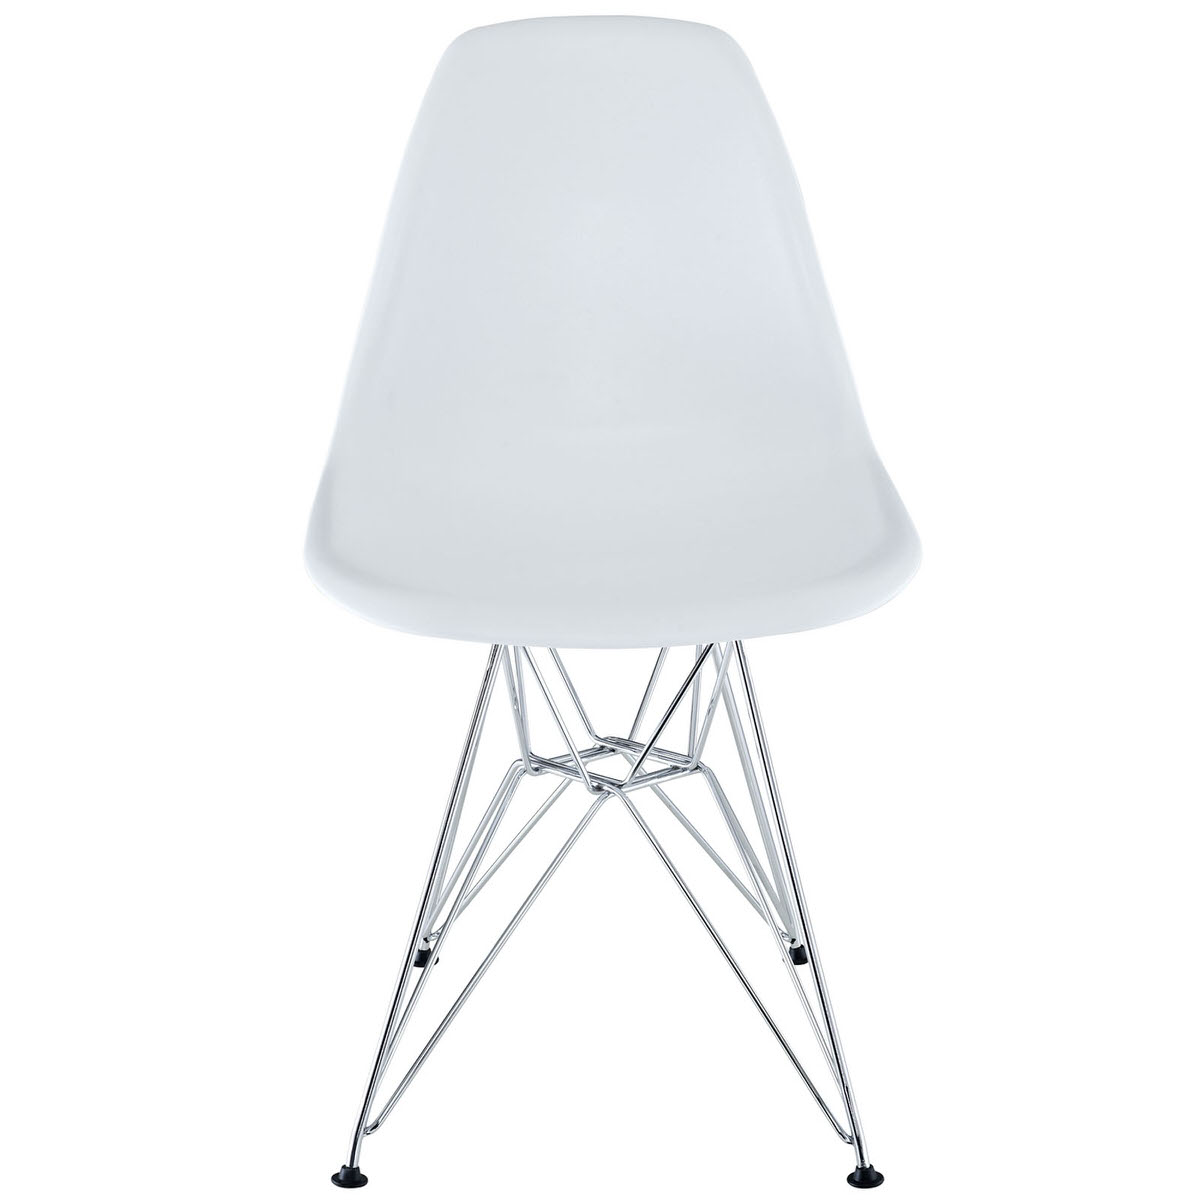 Peachy Paris Dining Side Chair White By Modern Living Beatyapartments Chair Design Images Beatyapartmentscom